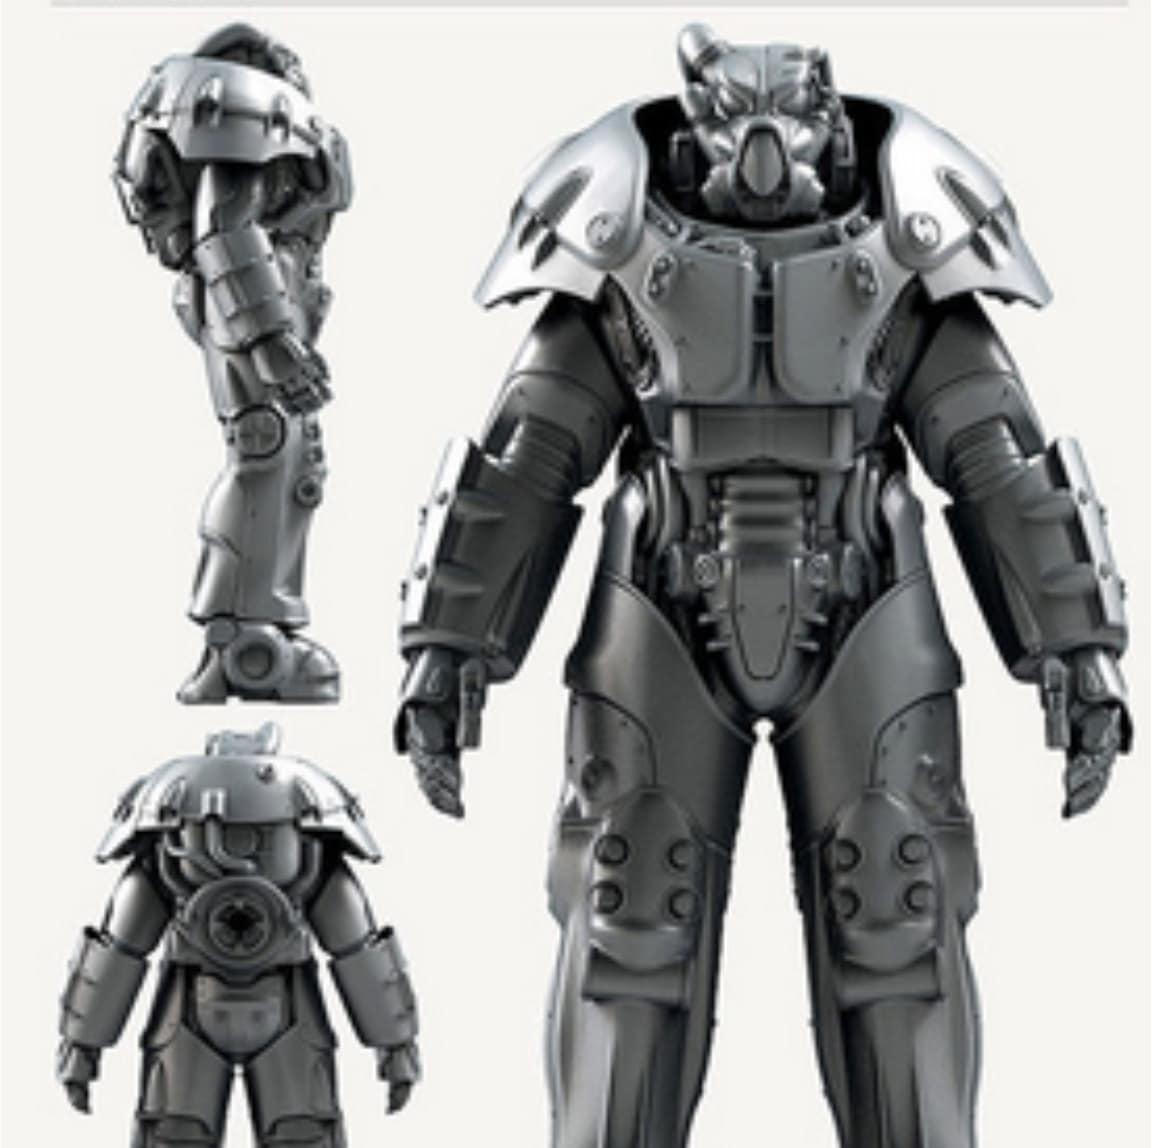 Fallout 4 X-01 power armor wearable cosplay pepakura paper ...